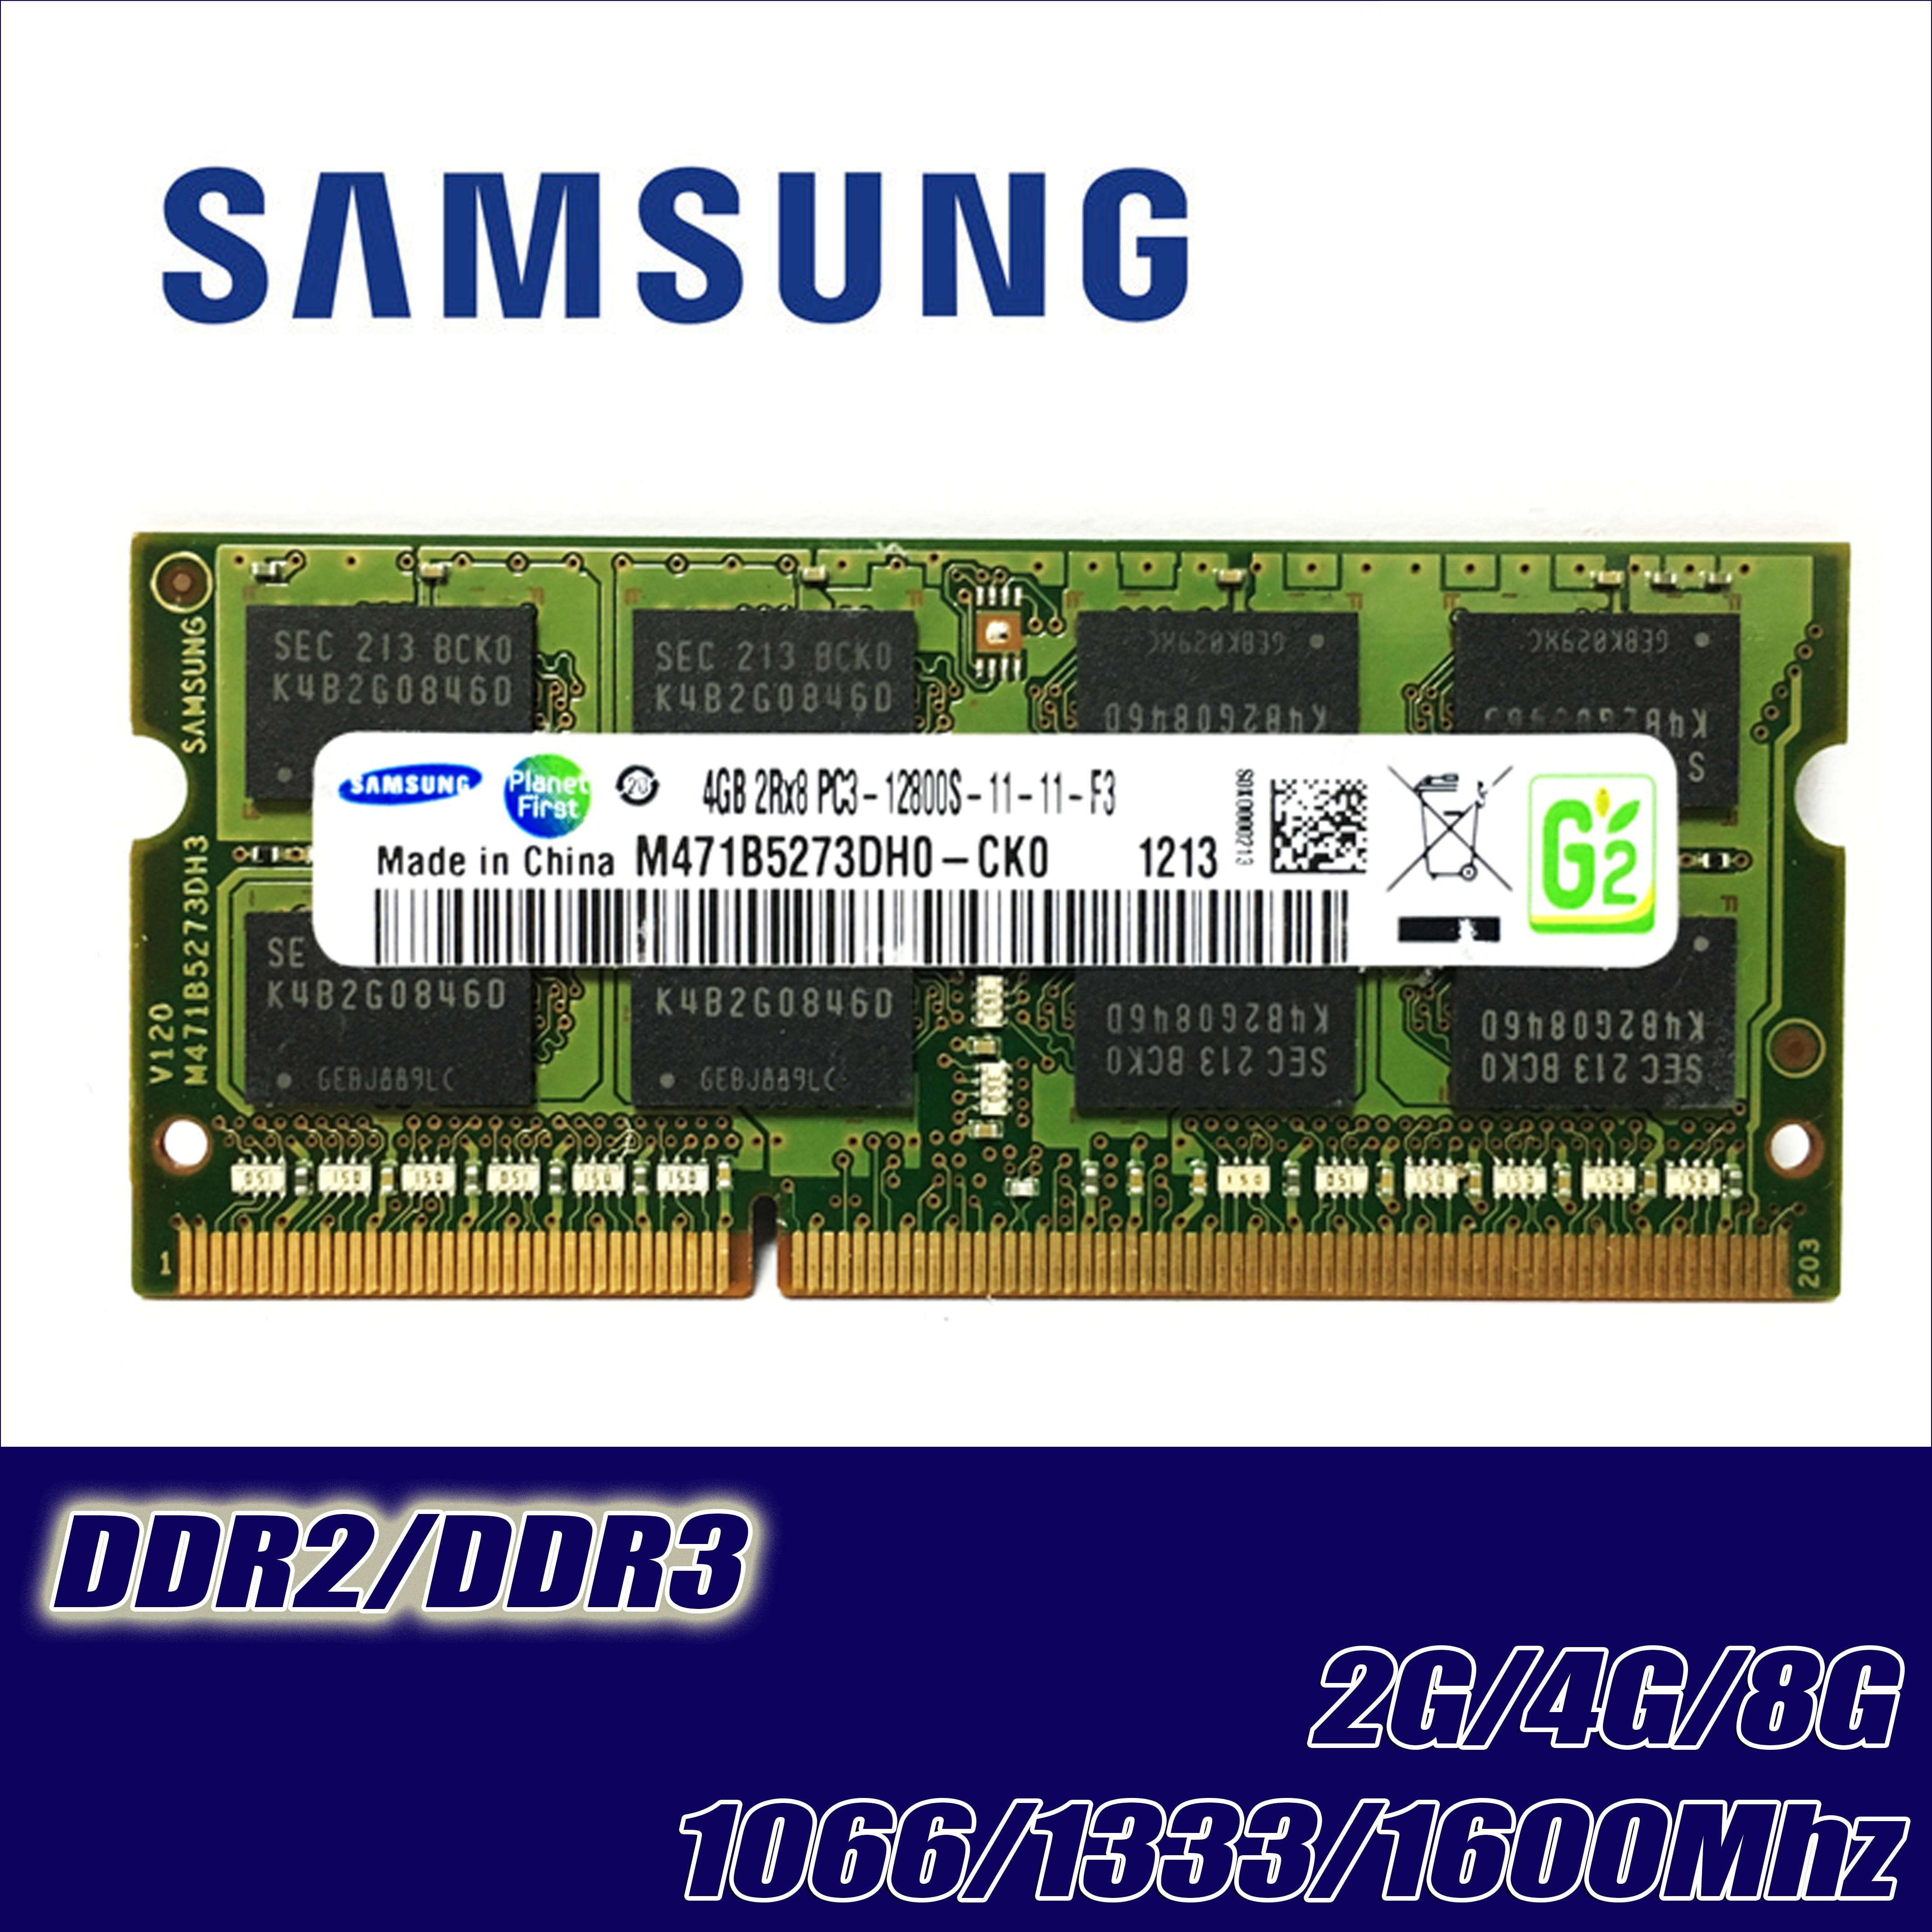 Samsung GB 4GB GB 2 8 2G 4G PC2 PC3 DDR2 DDR3 667Mhz 800Mhz 1333hz 1600Mhz 5300S 6400 8500 10600 Laptop notebook memória RAM ECC